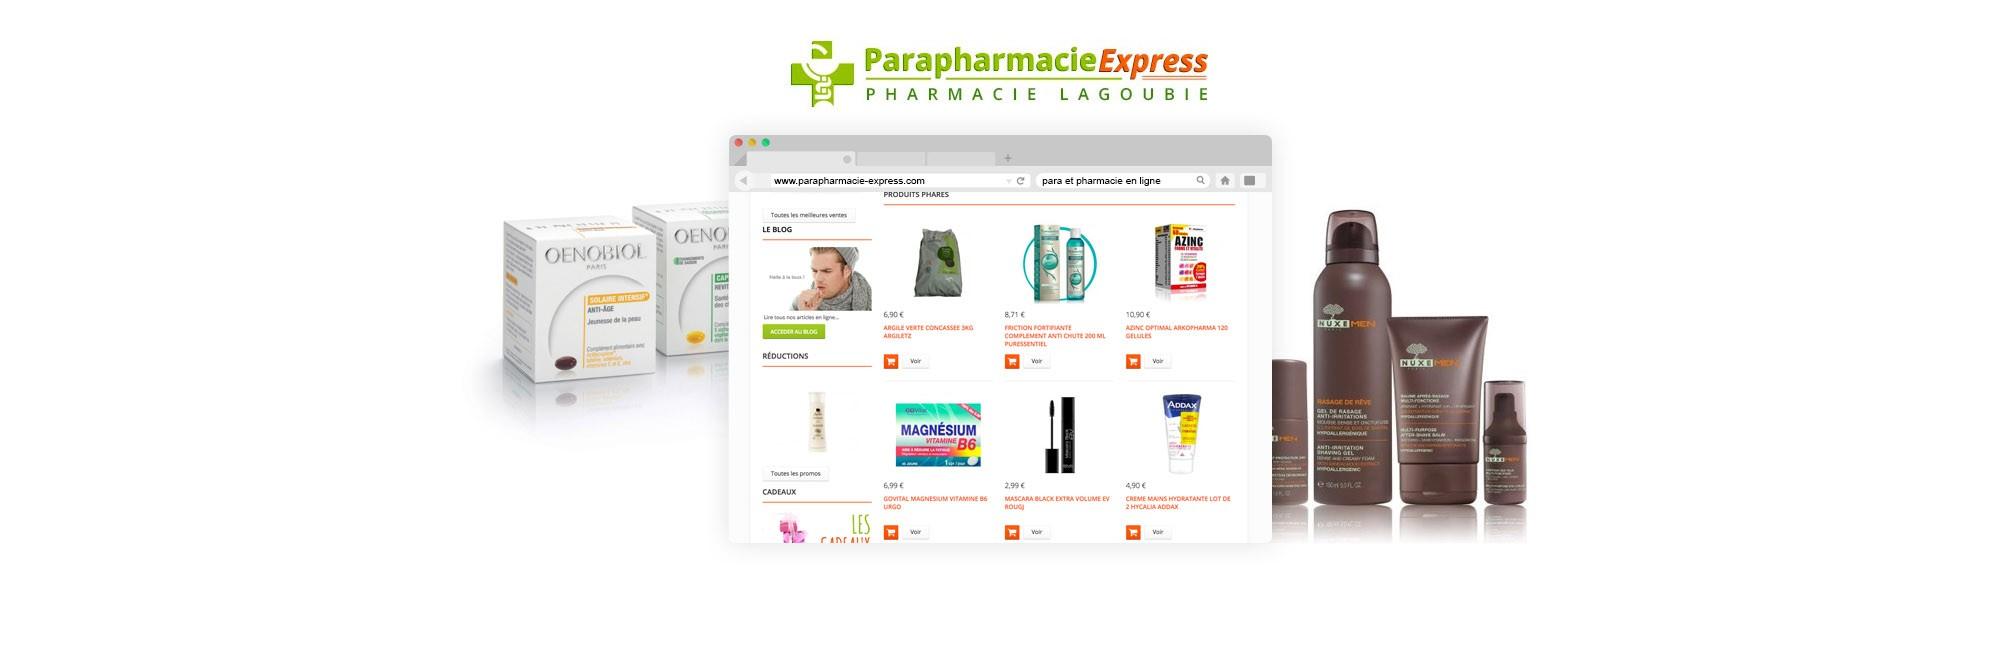 Parapharmacie express